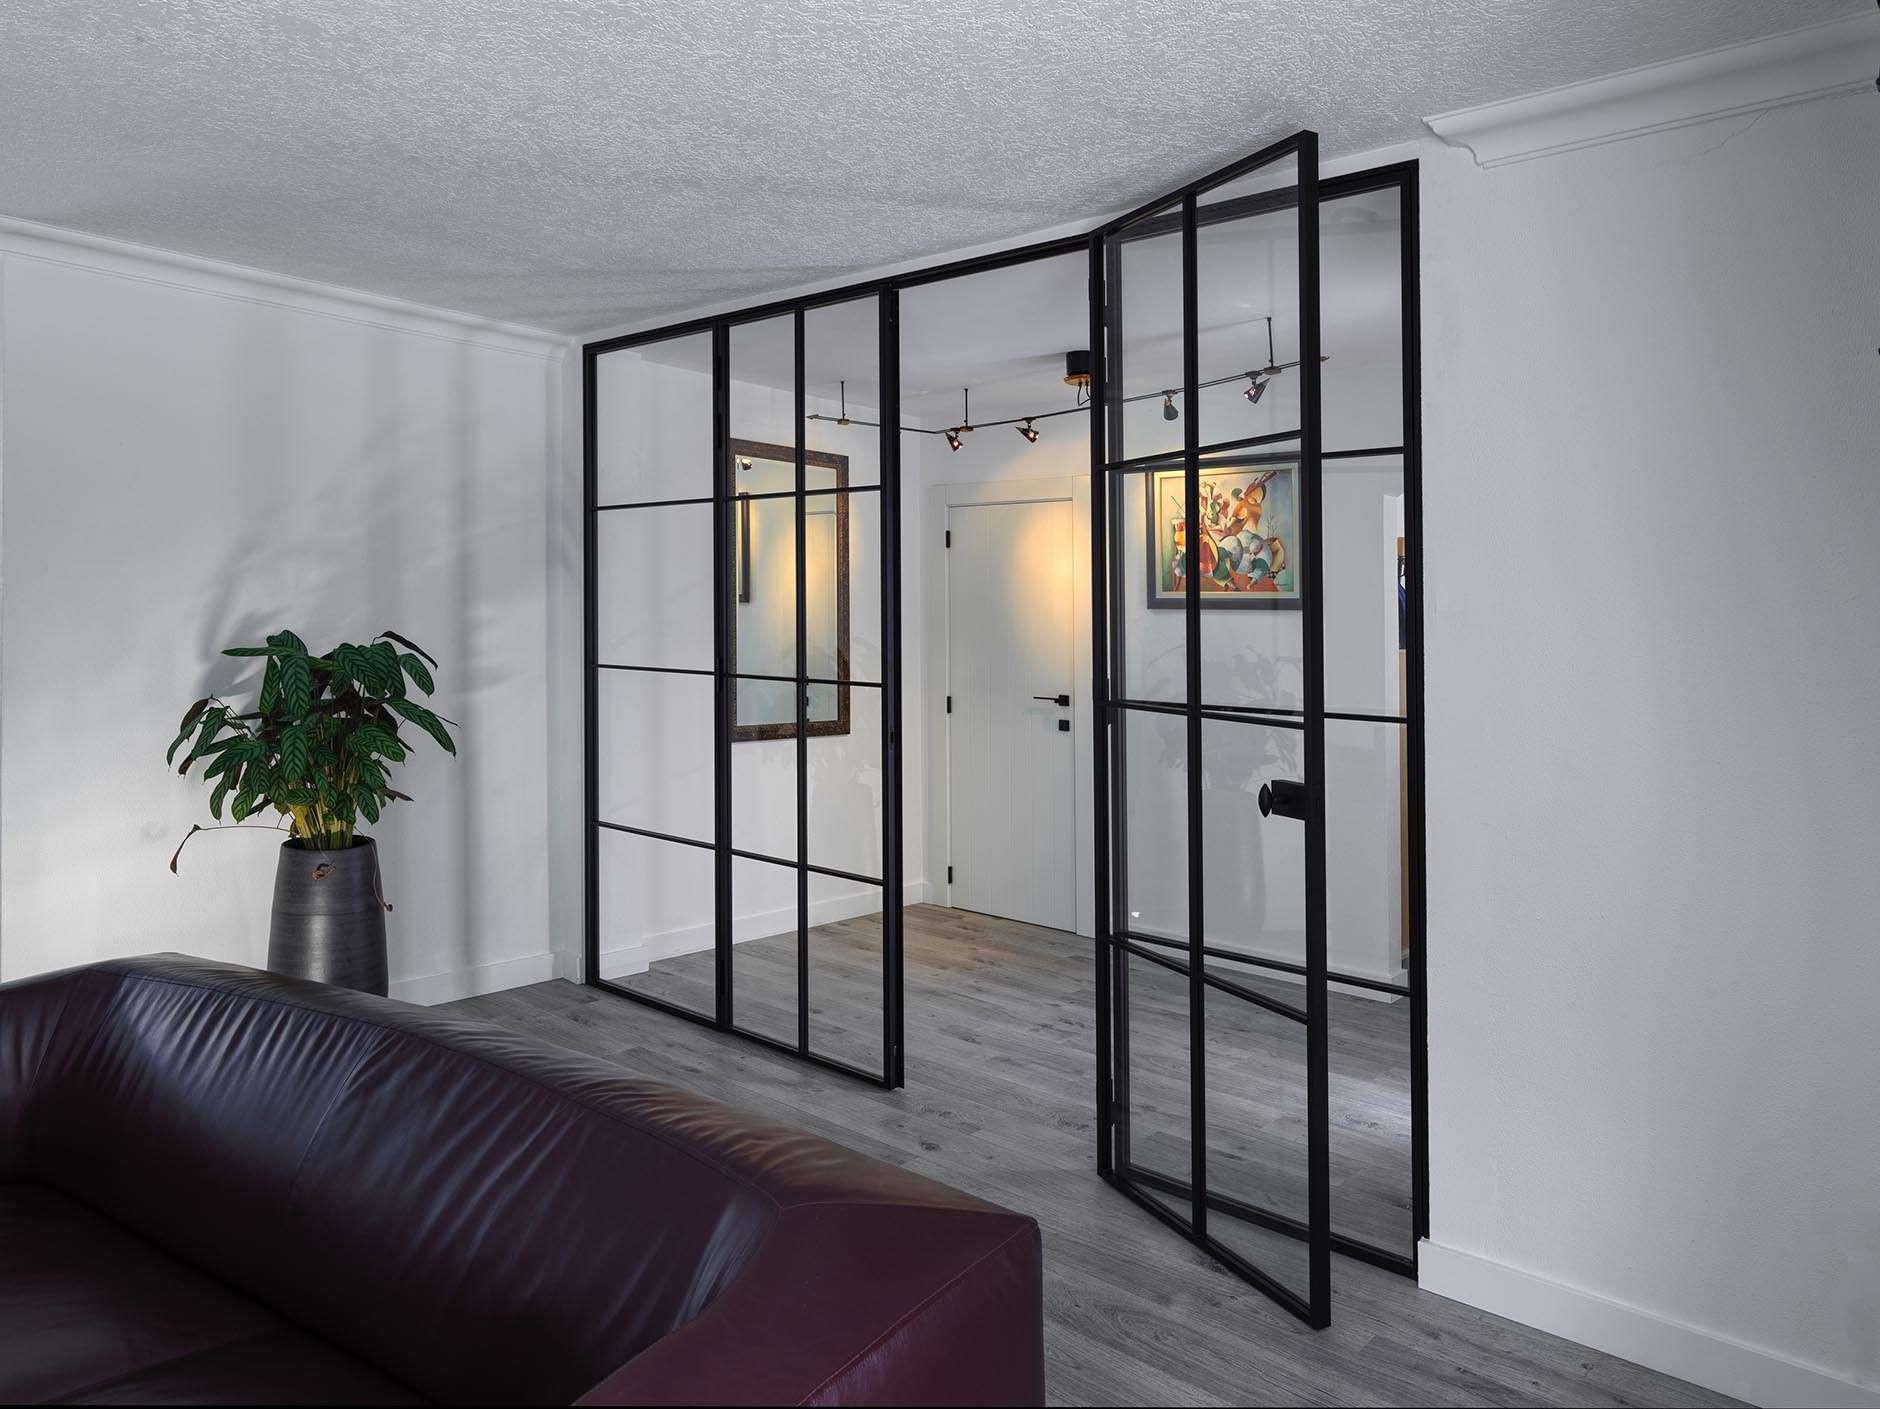 glazen-wand-dubbele-deur-plafondhoog